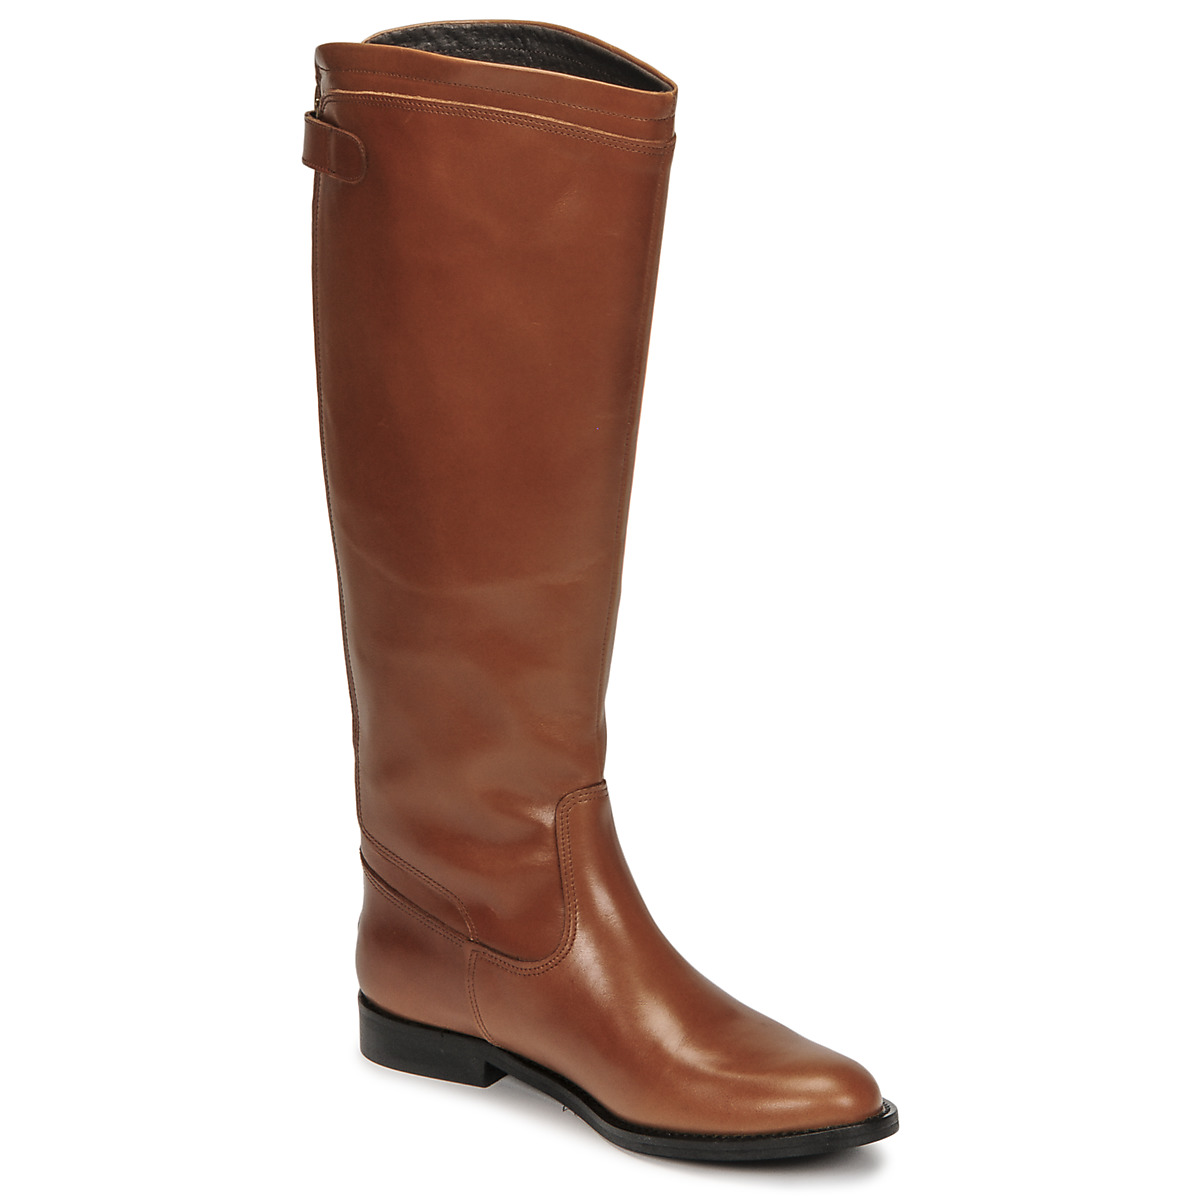 Jonak BATURINGI Cognac - Kostenloser Versand bei Spartoode ! - Schuhe Klassische Stiefel Damen 175,00 €